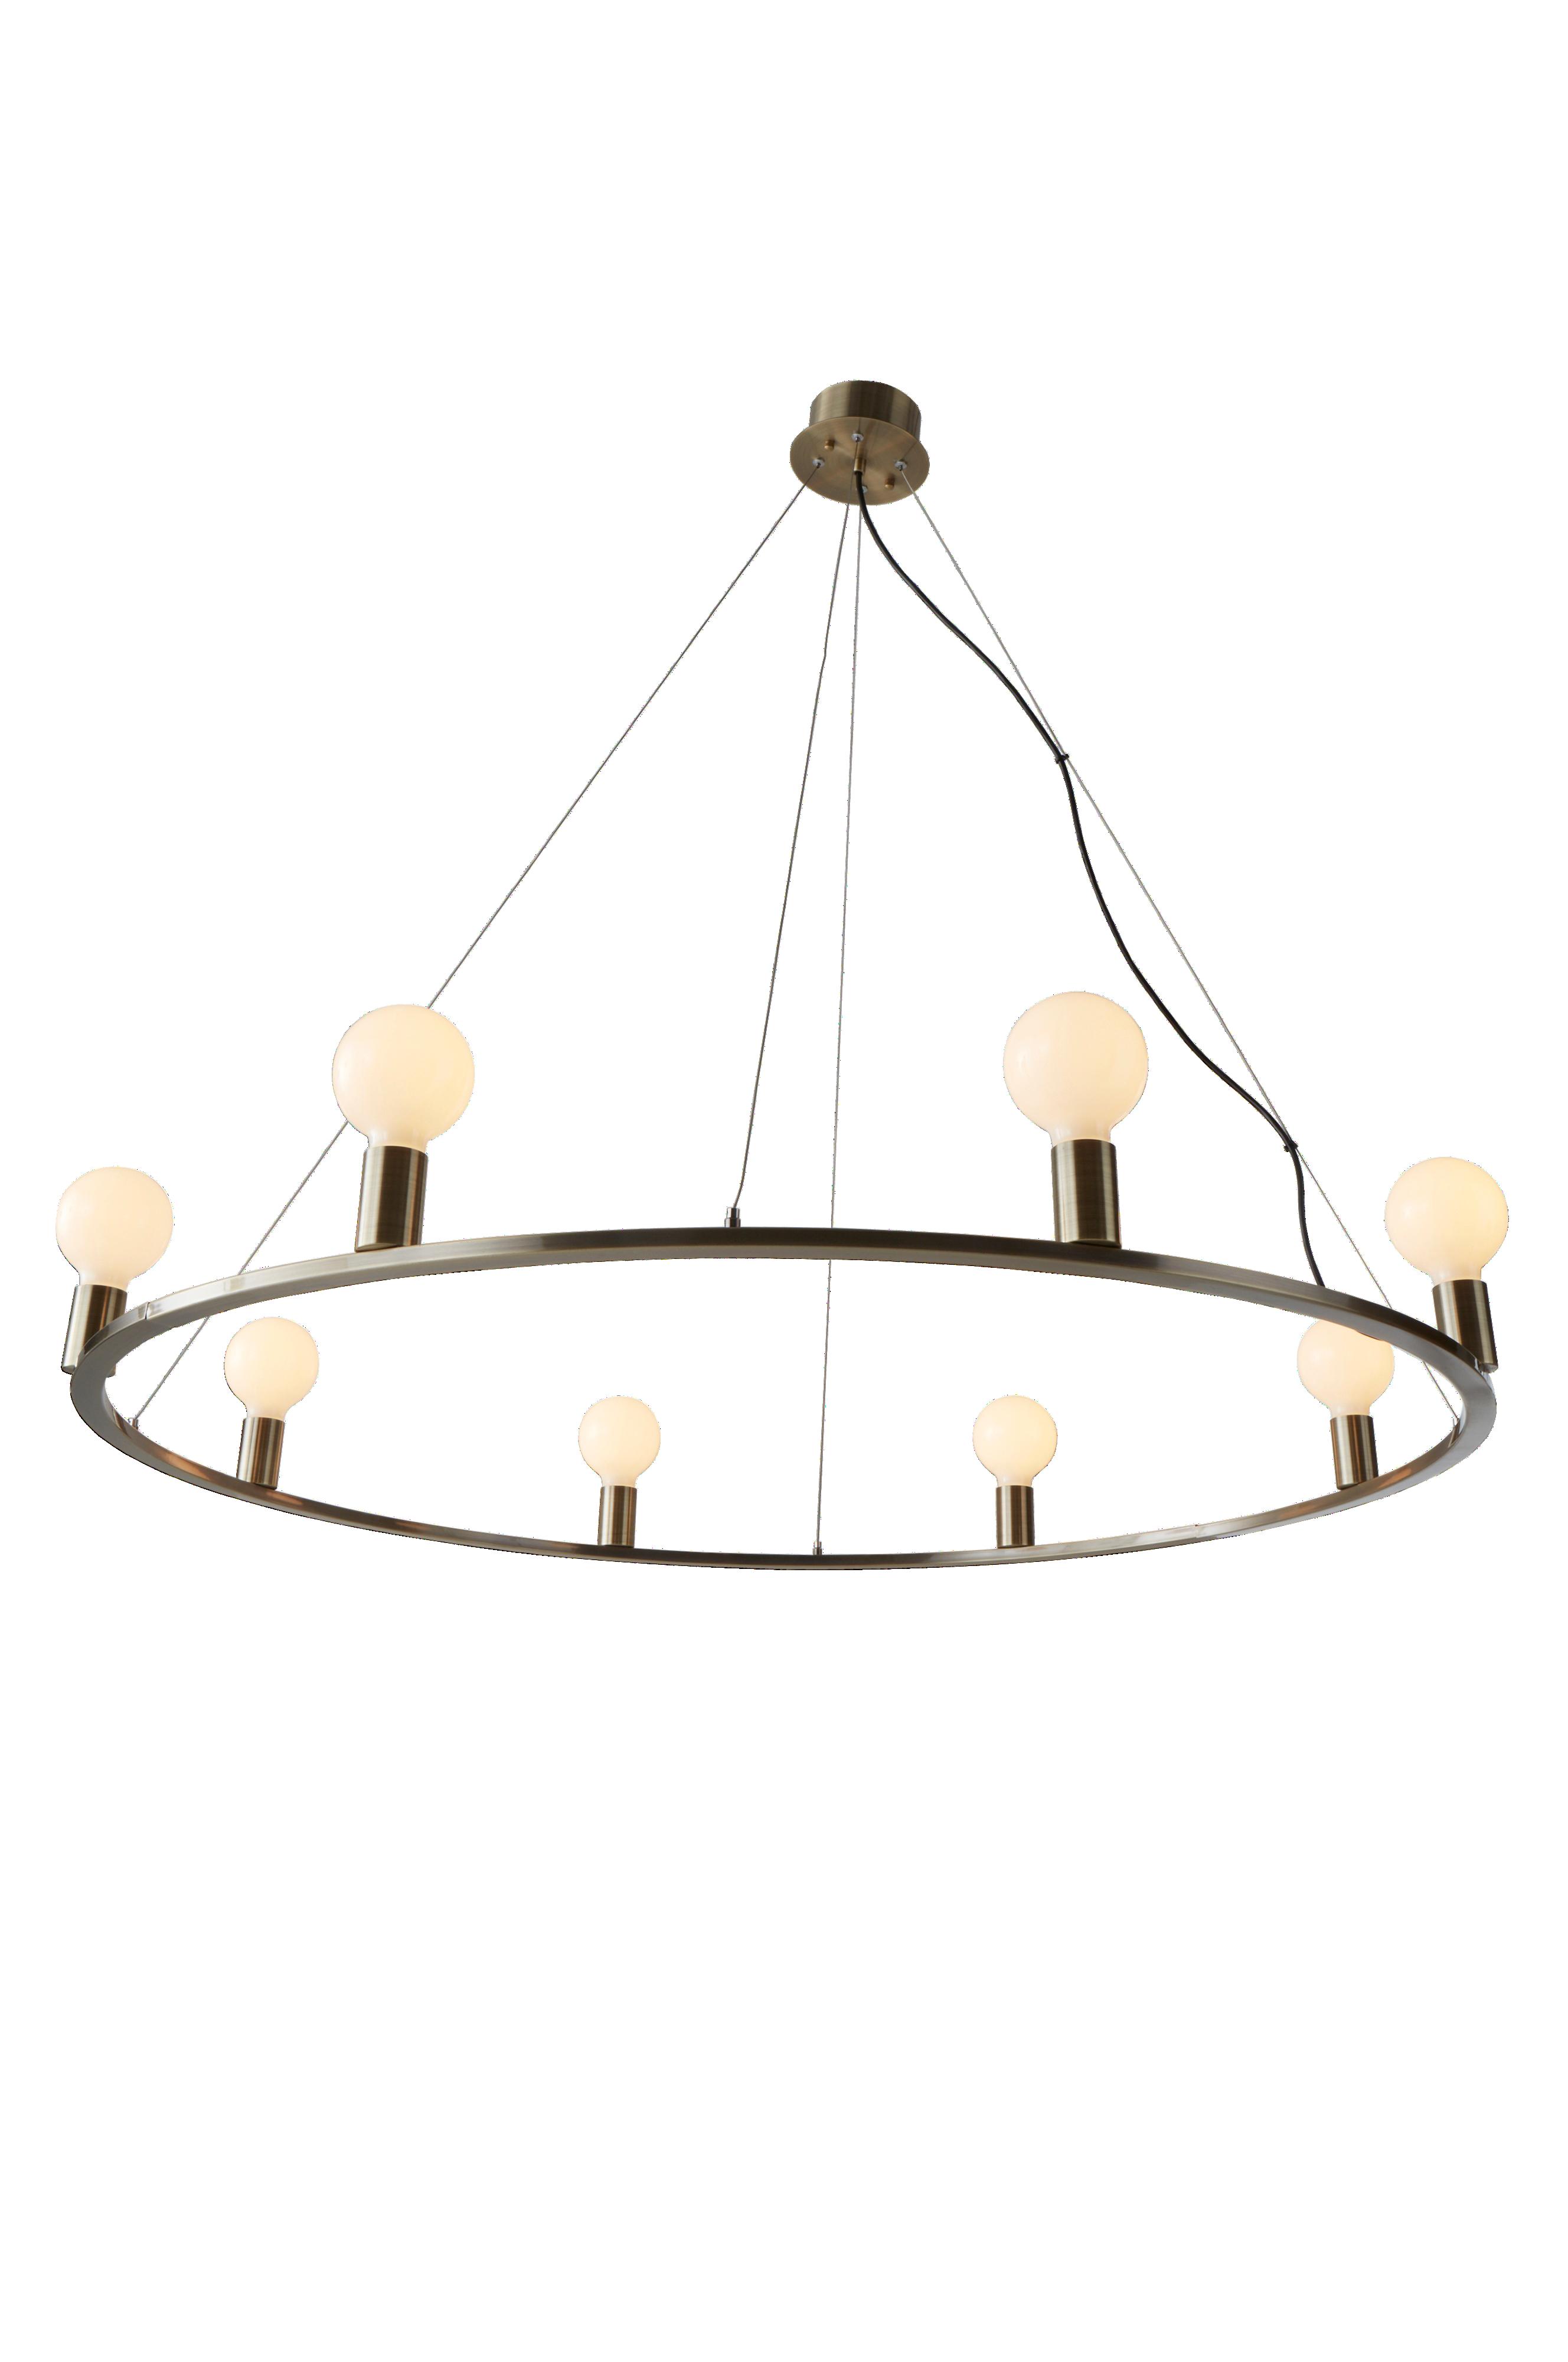 Jotex ROYAL taklampe Ø 120 cm Svart Belysning Homeroom.no